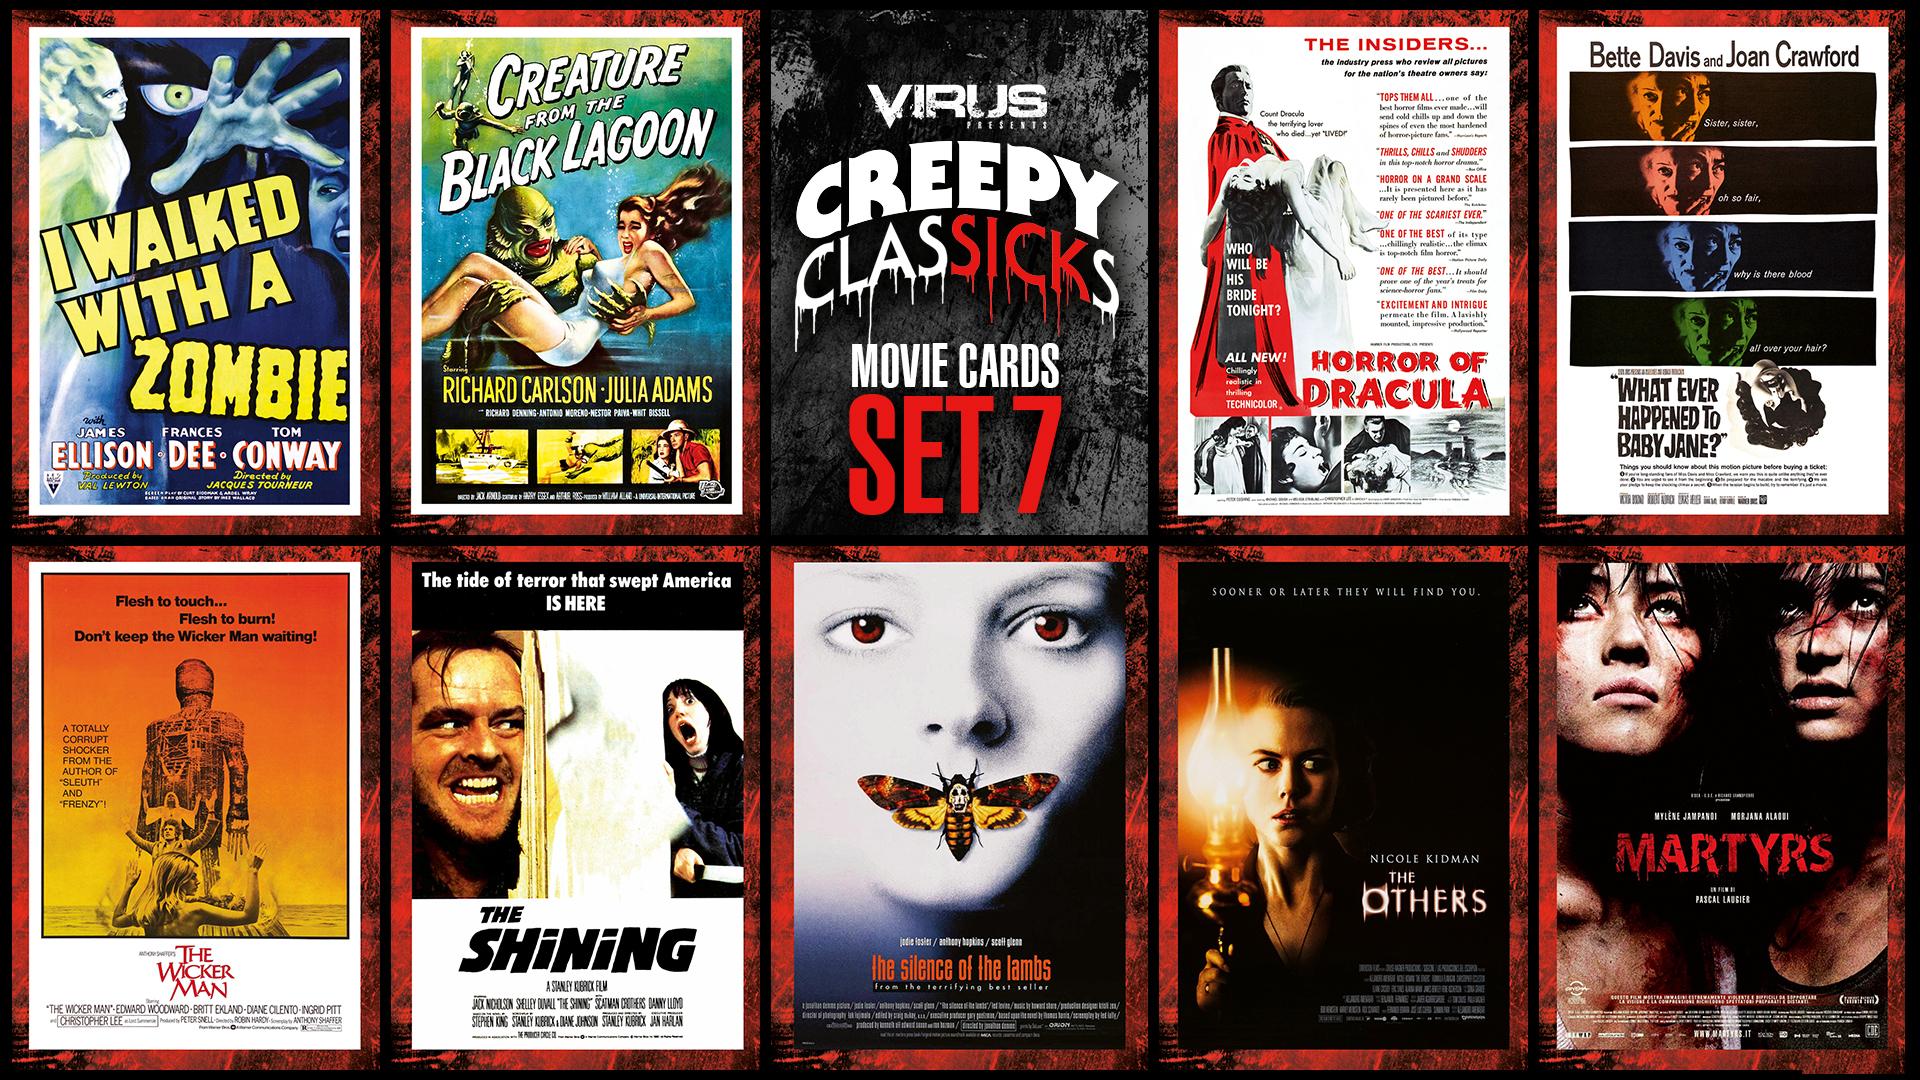 VIRUS Creepy ClasSICKs Movie Cards Set #07